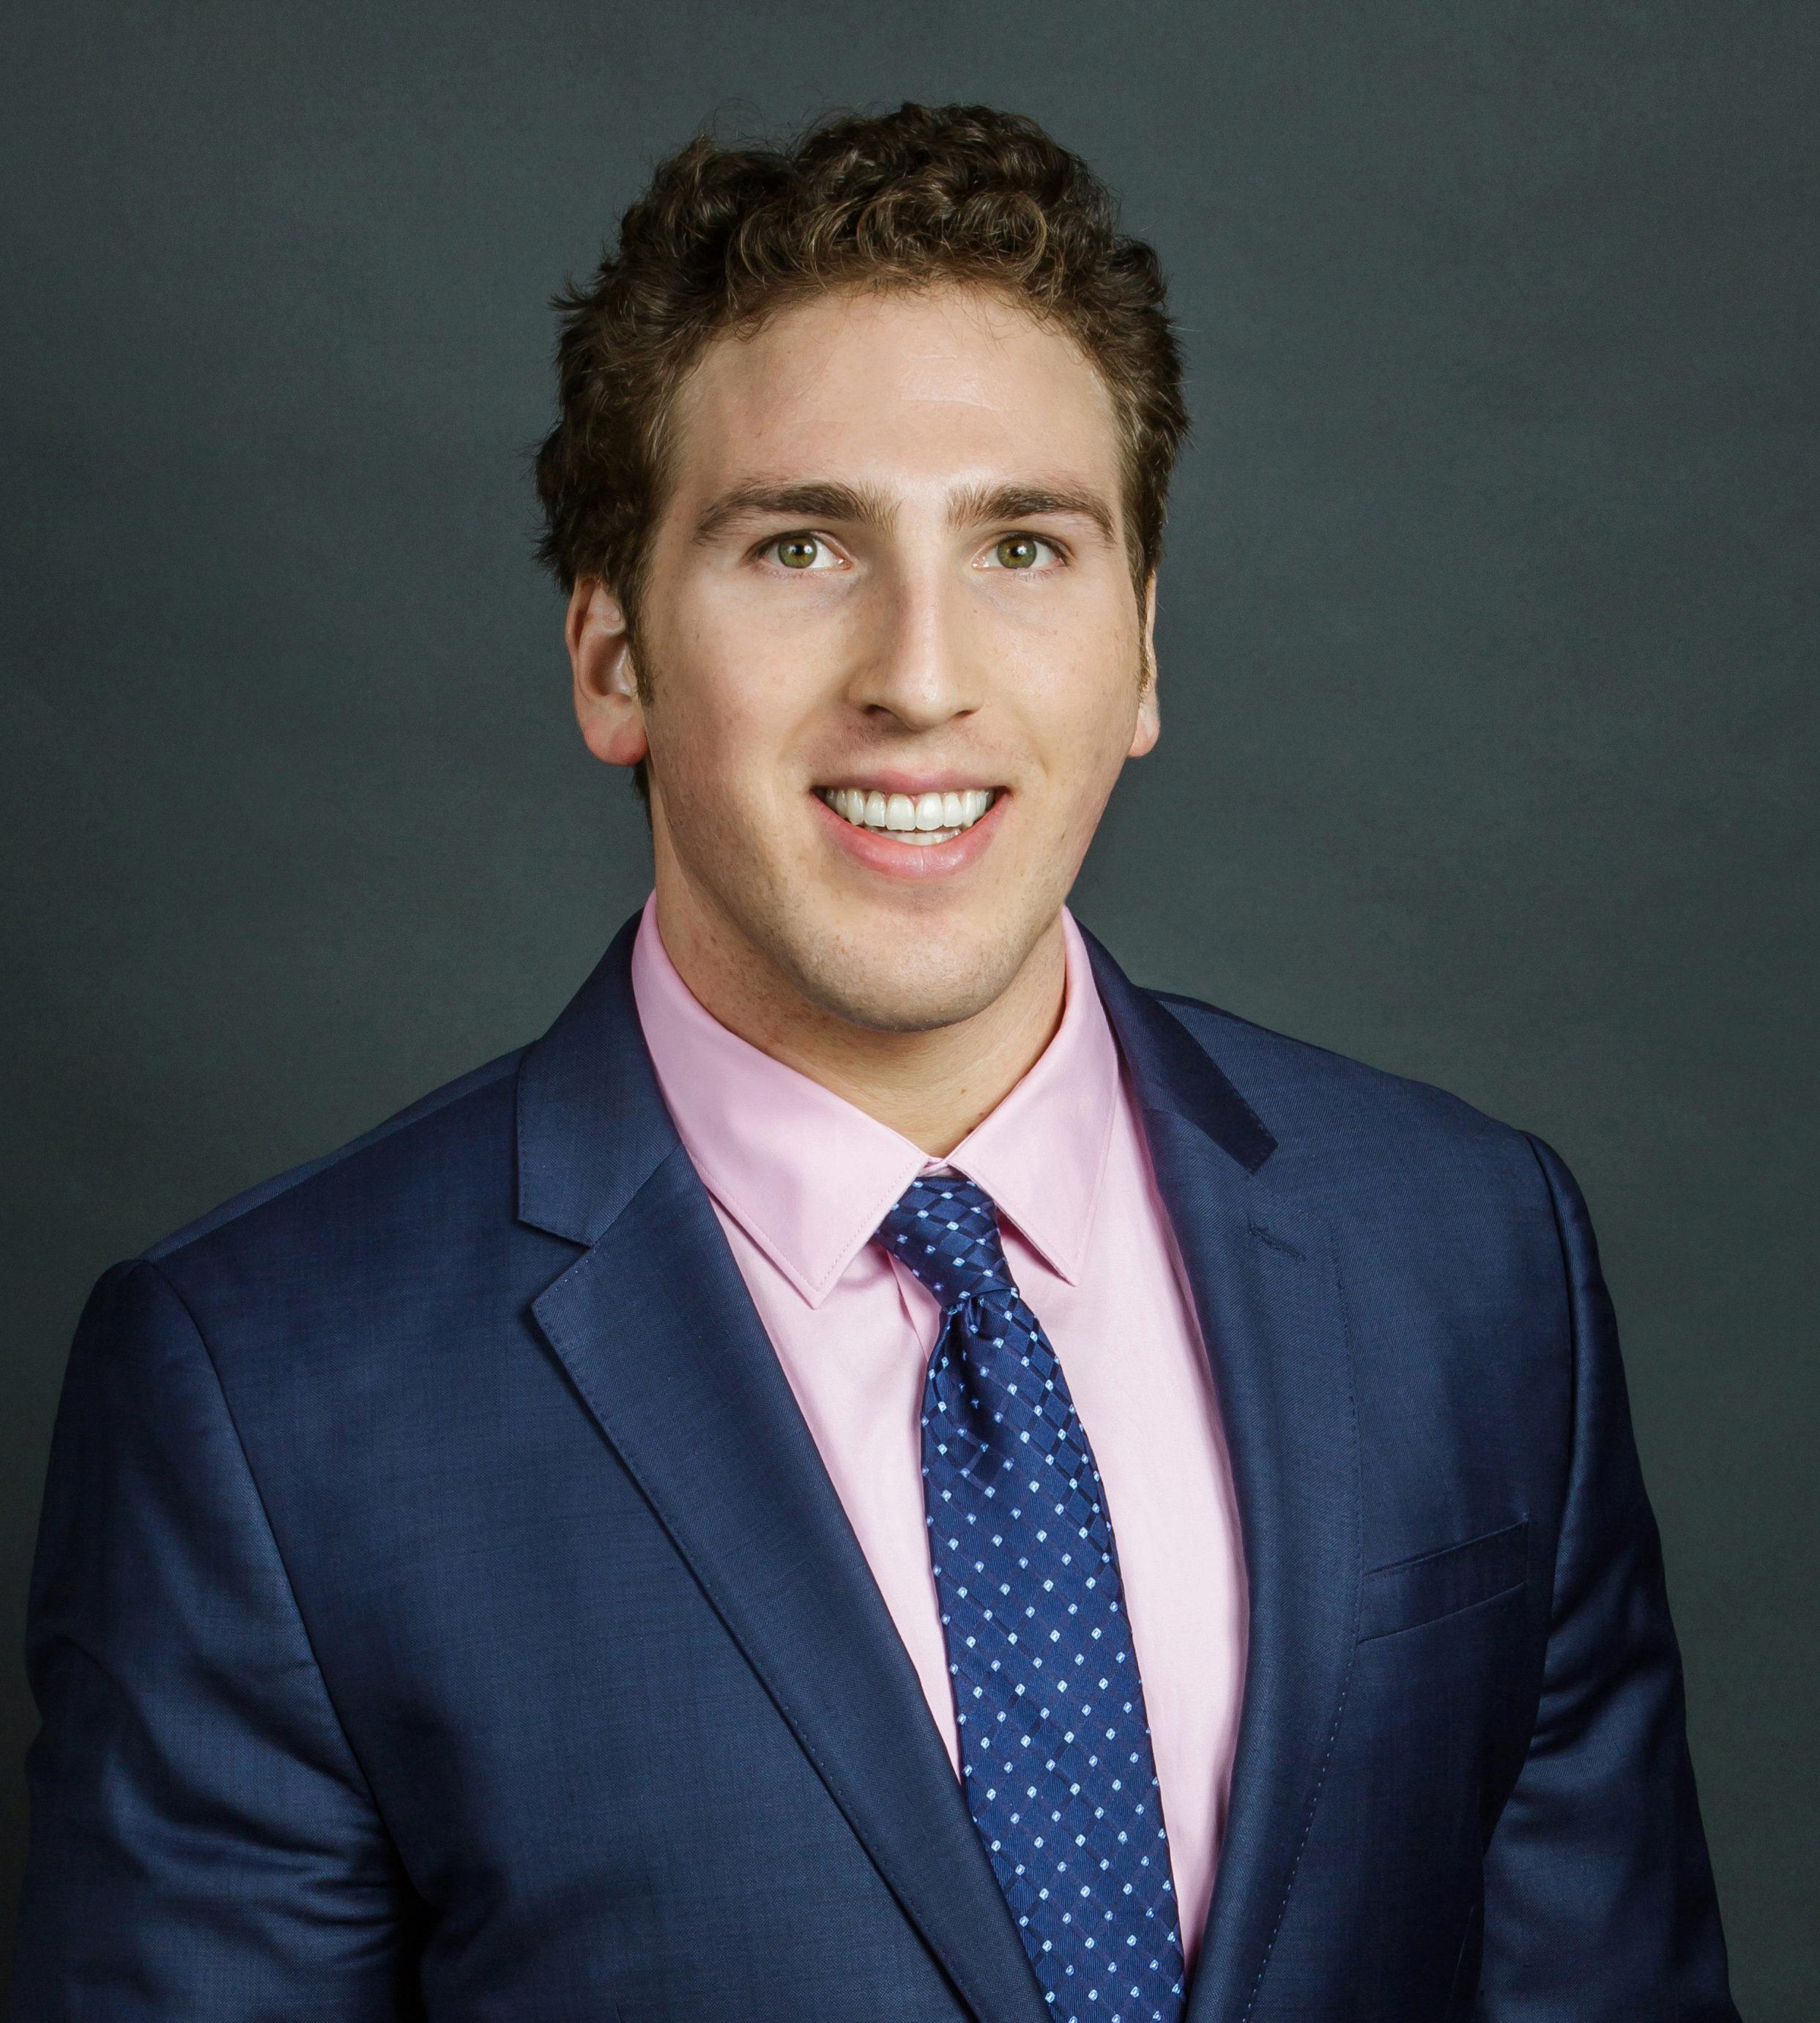 Matthew Bloomfield